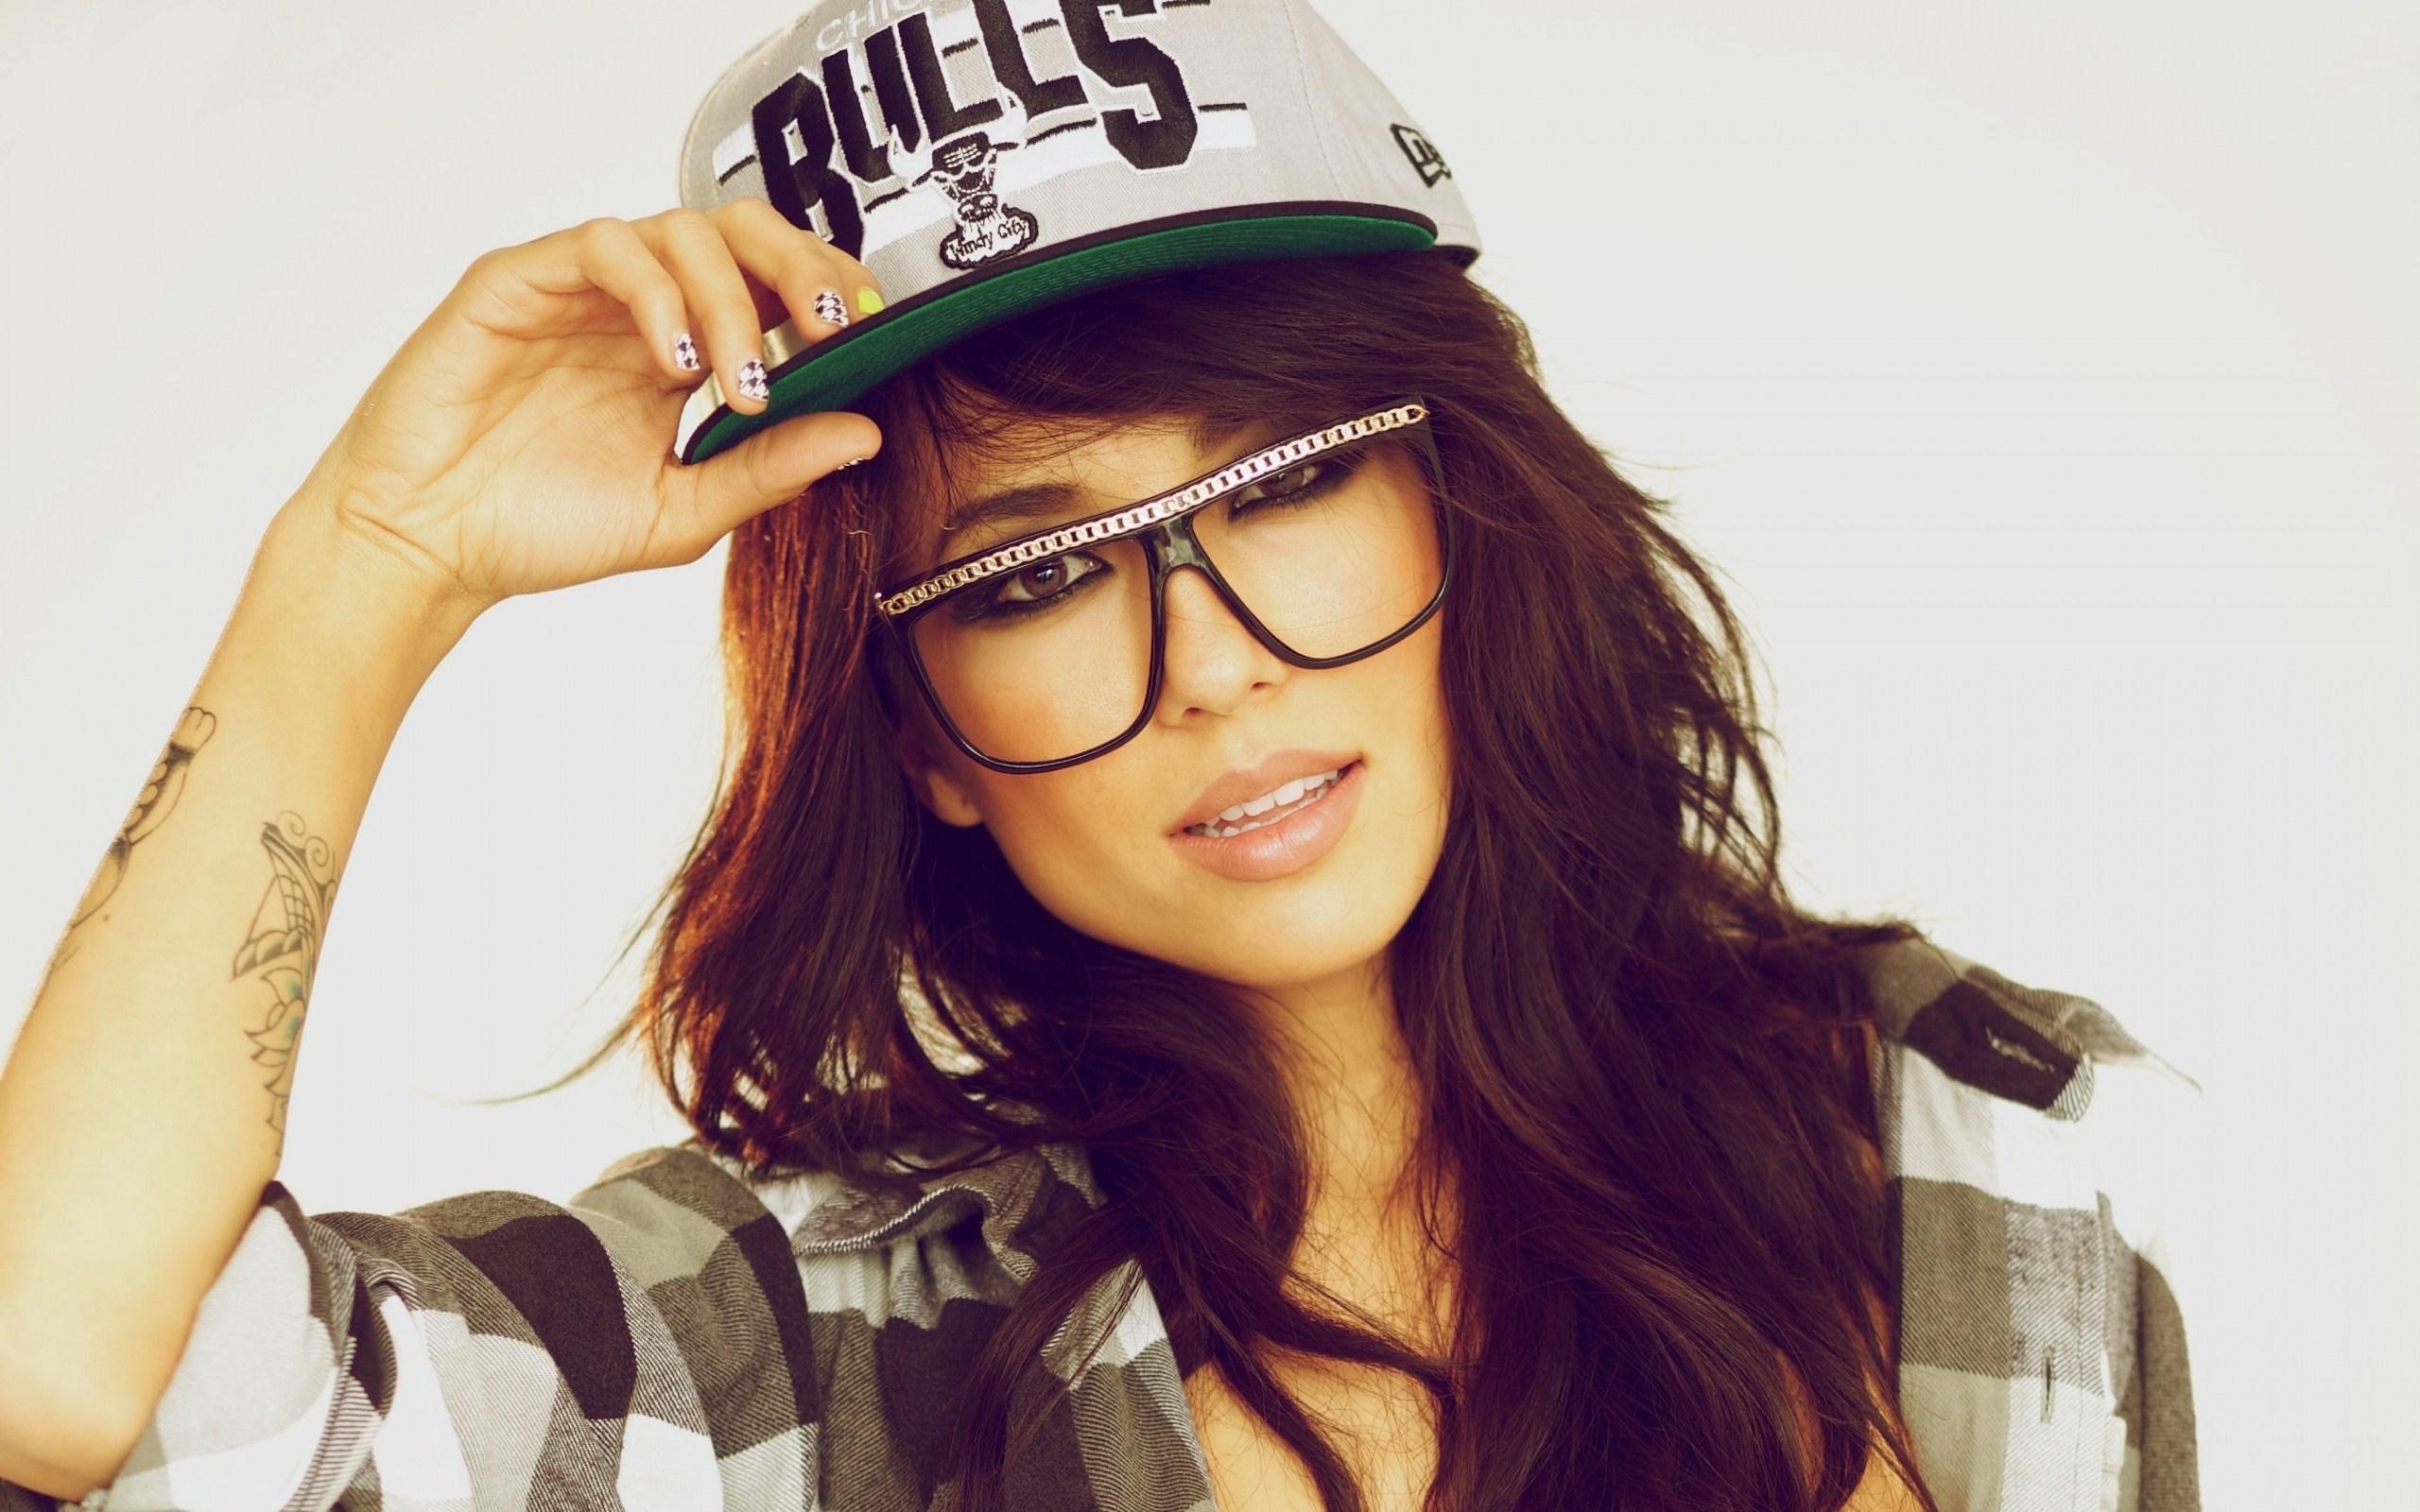 Beauty Girl Alie Layus Glasses Cap